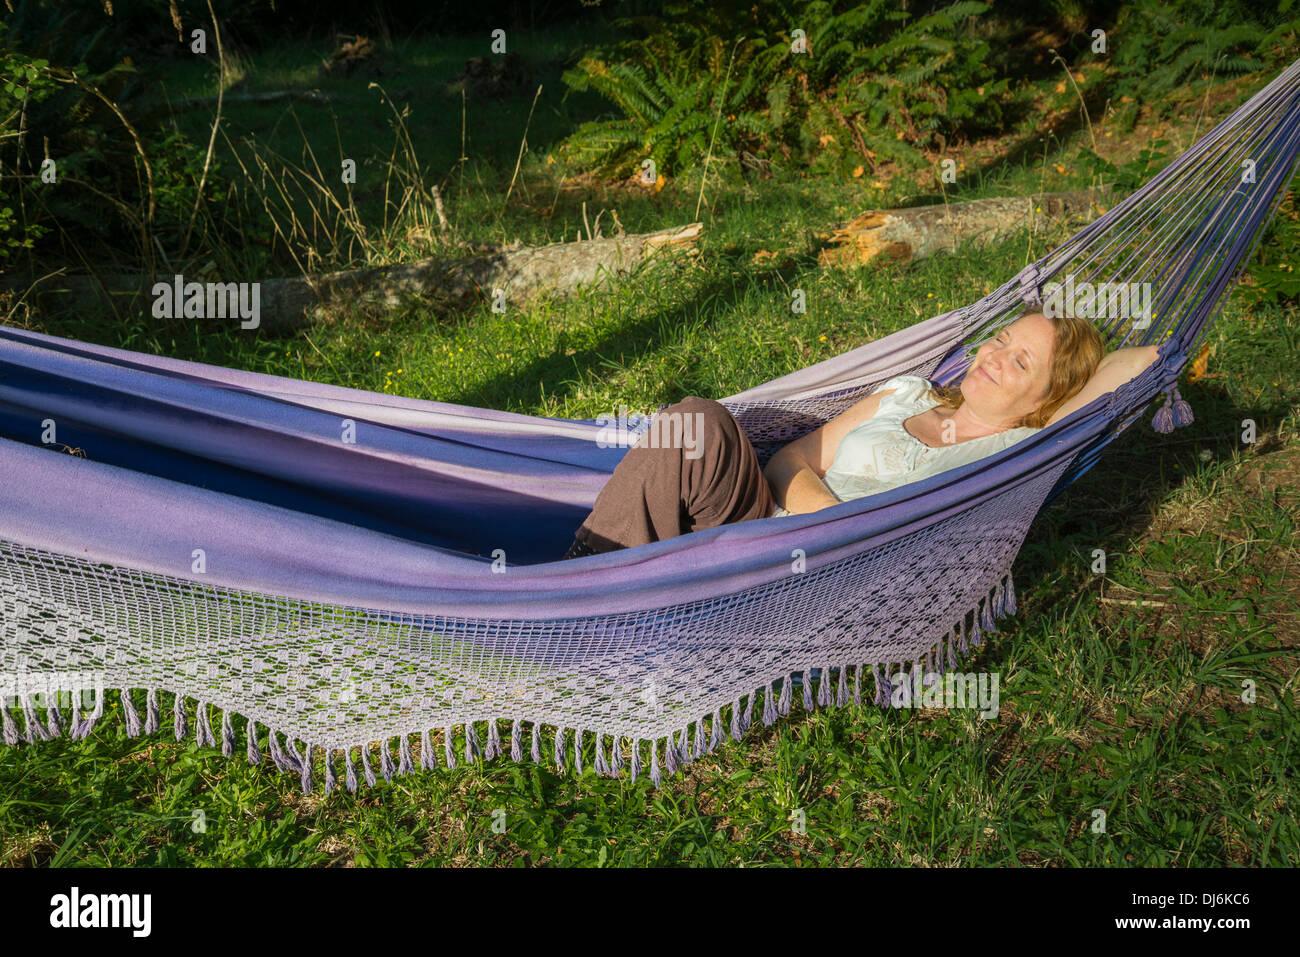 Woman enjoying rest in hammock - Stock Image